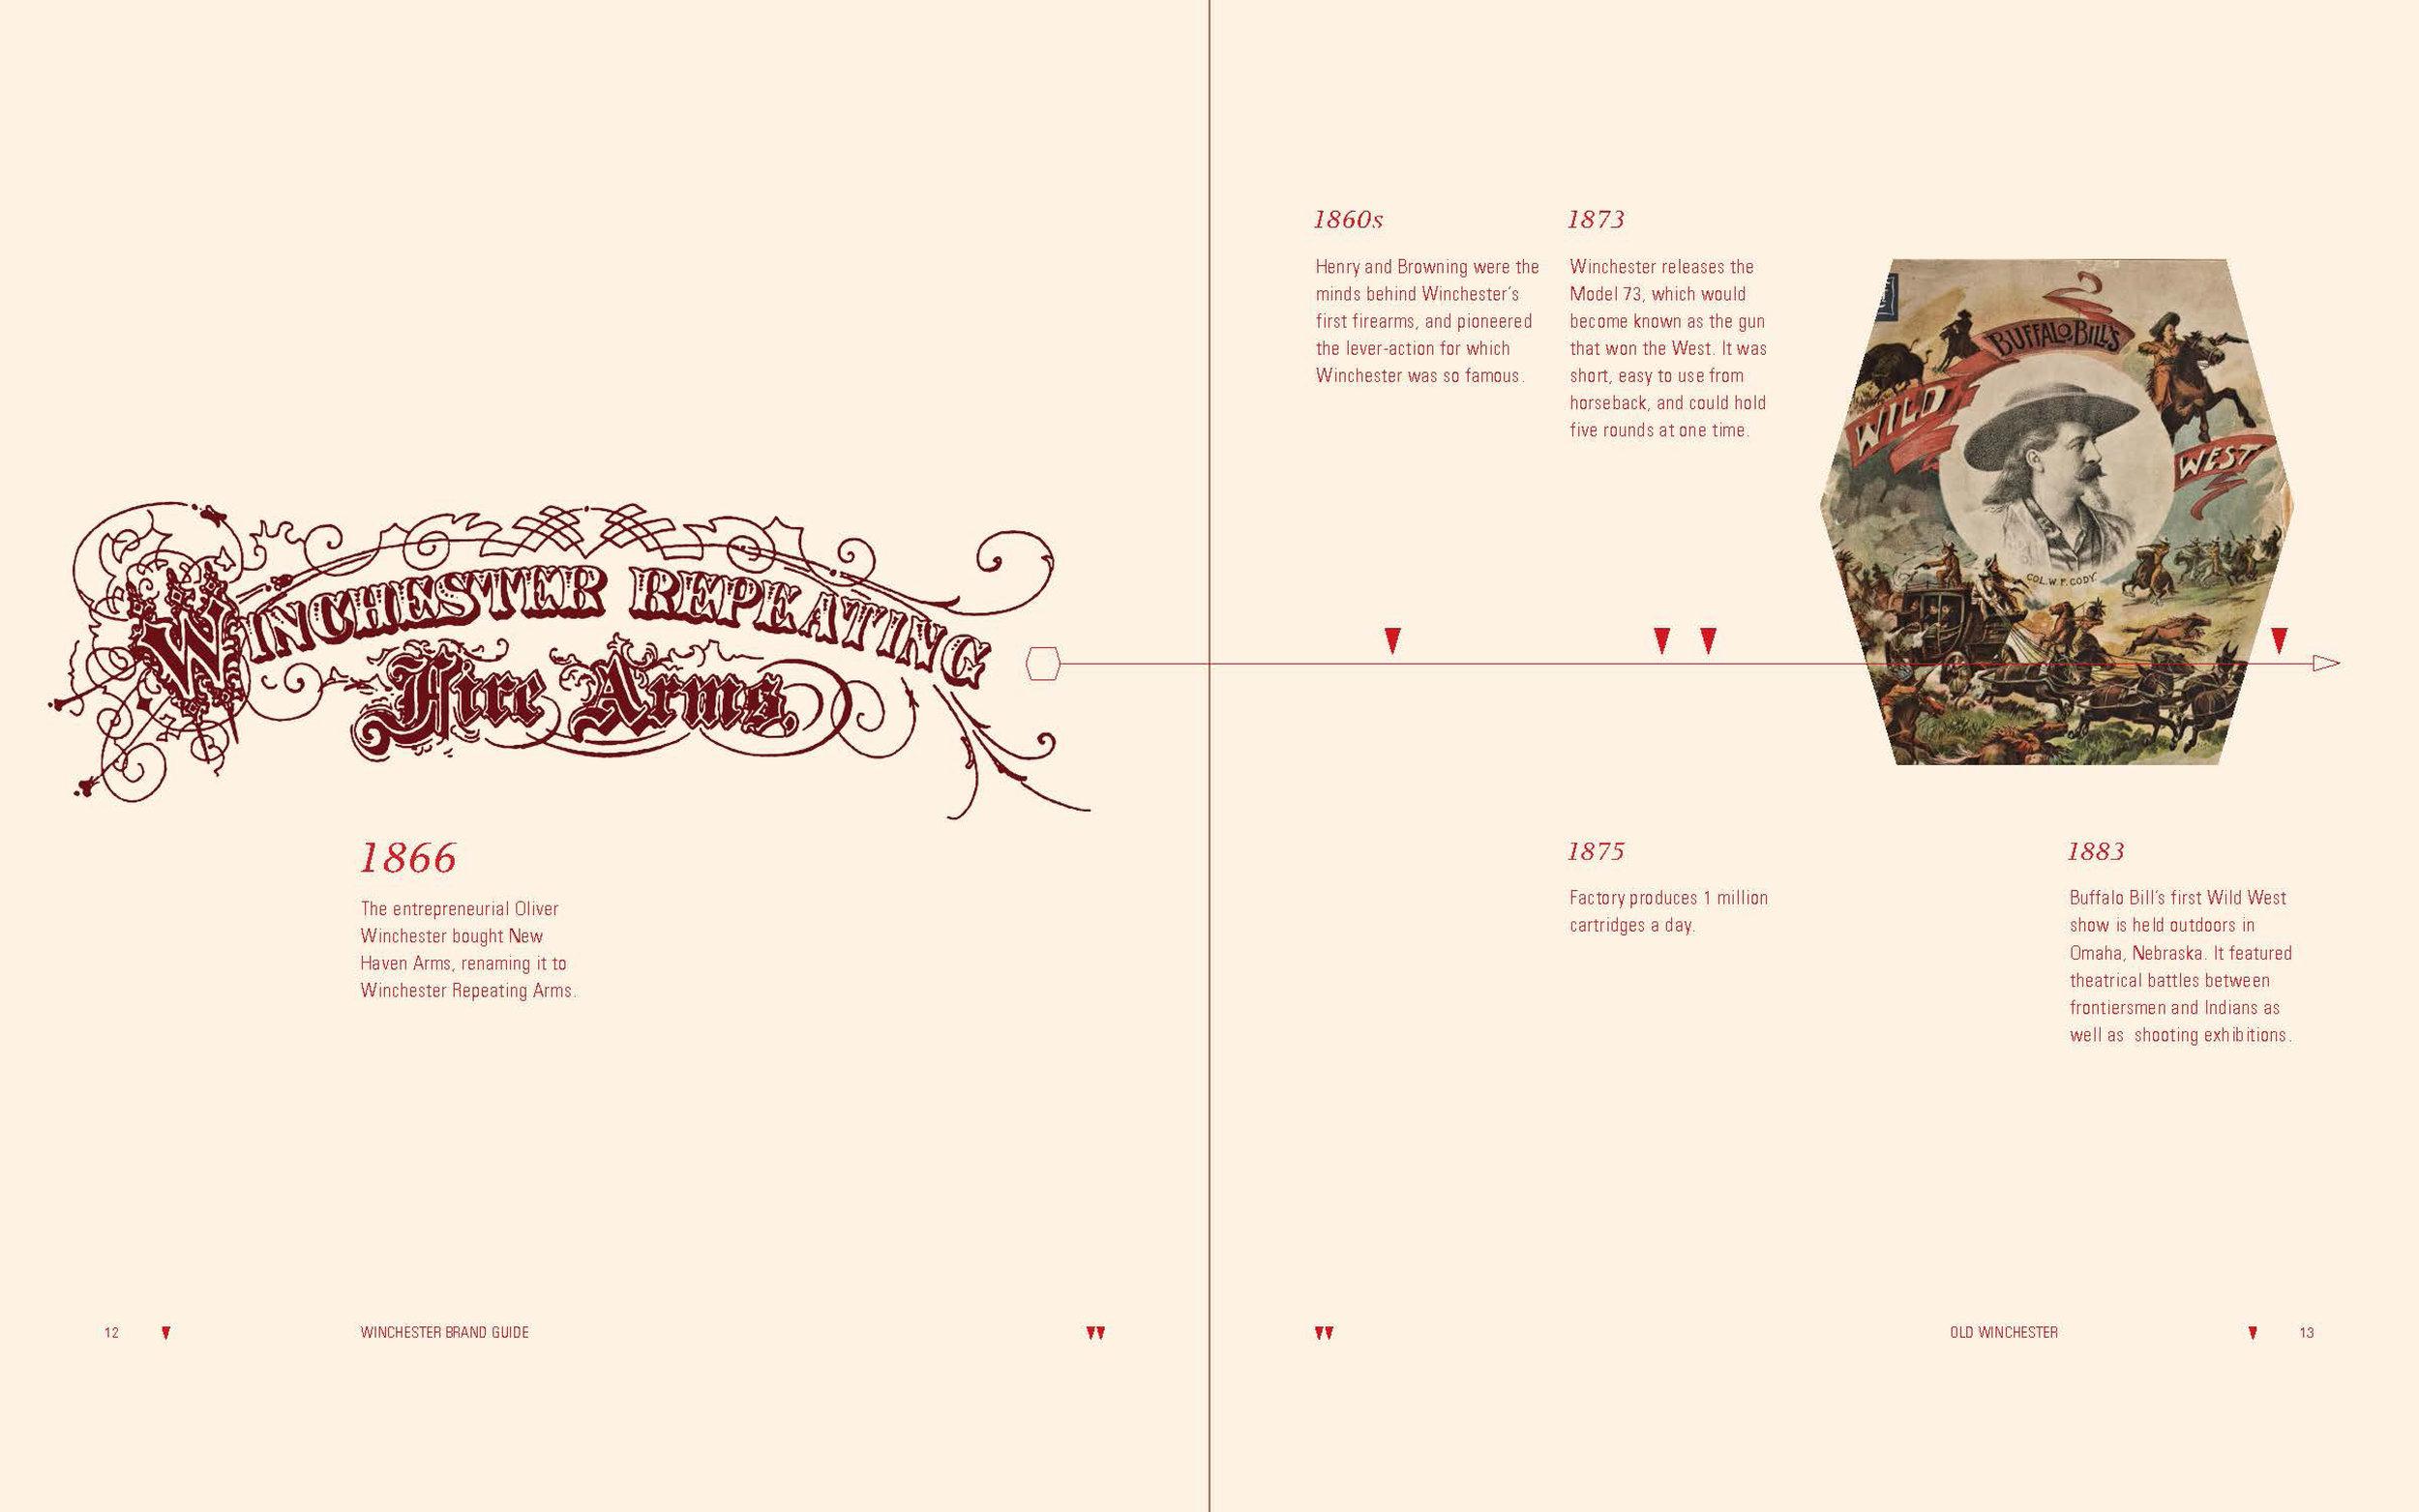 Winchester Process Book8.jpg